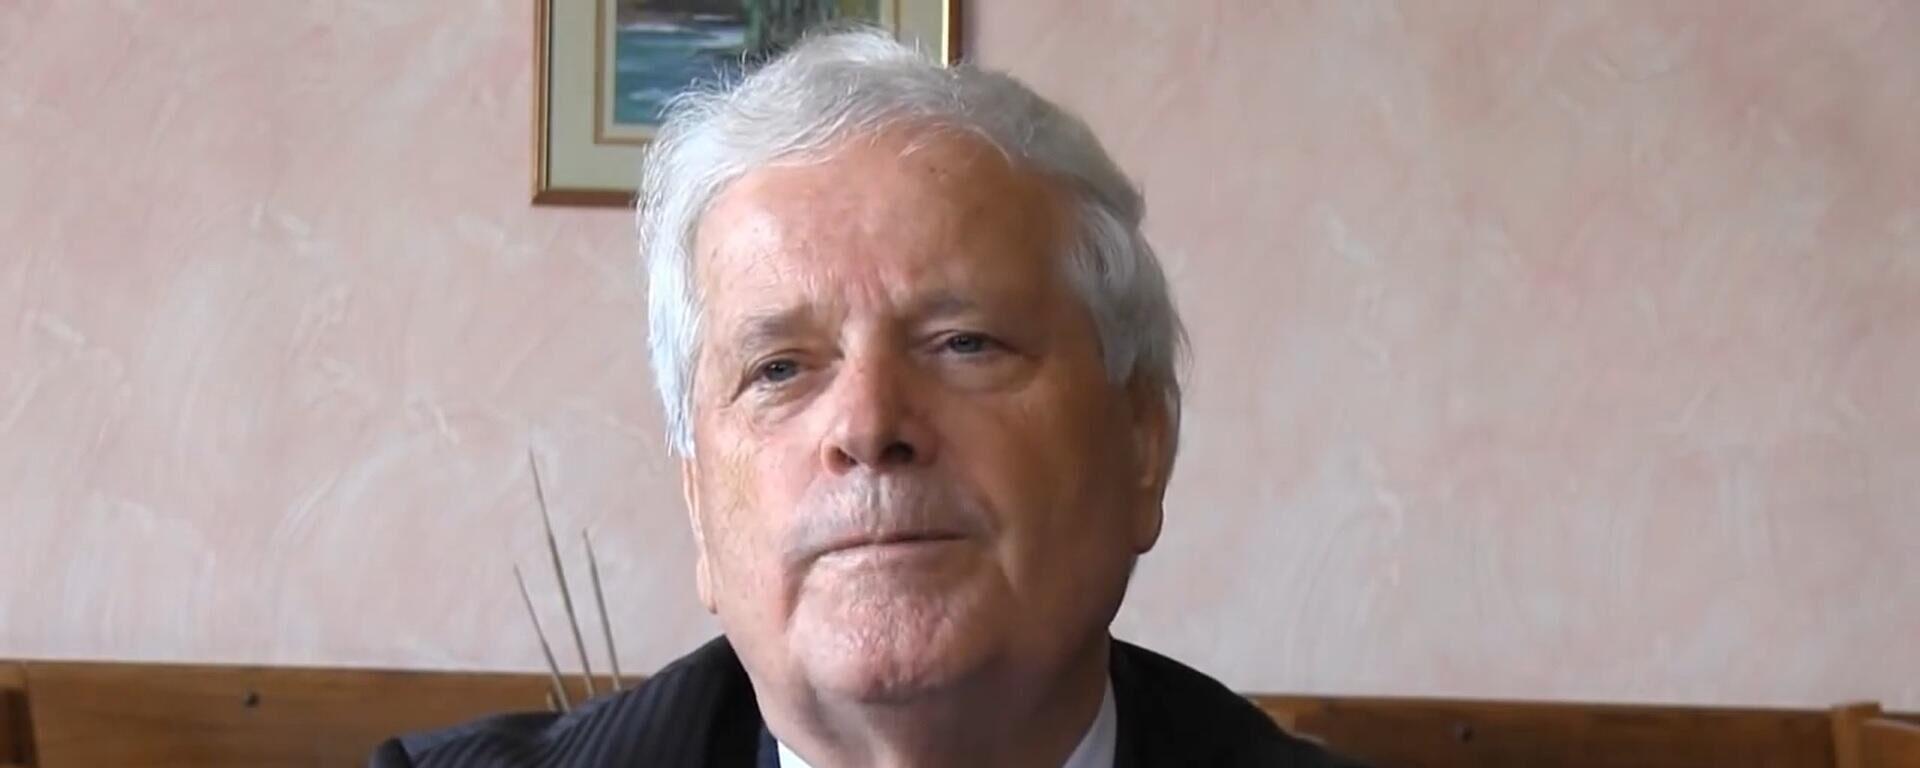 Fikret Abdić Babo - Sputnik Srbija, 1920, 03.10.2016